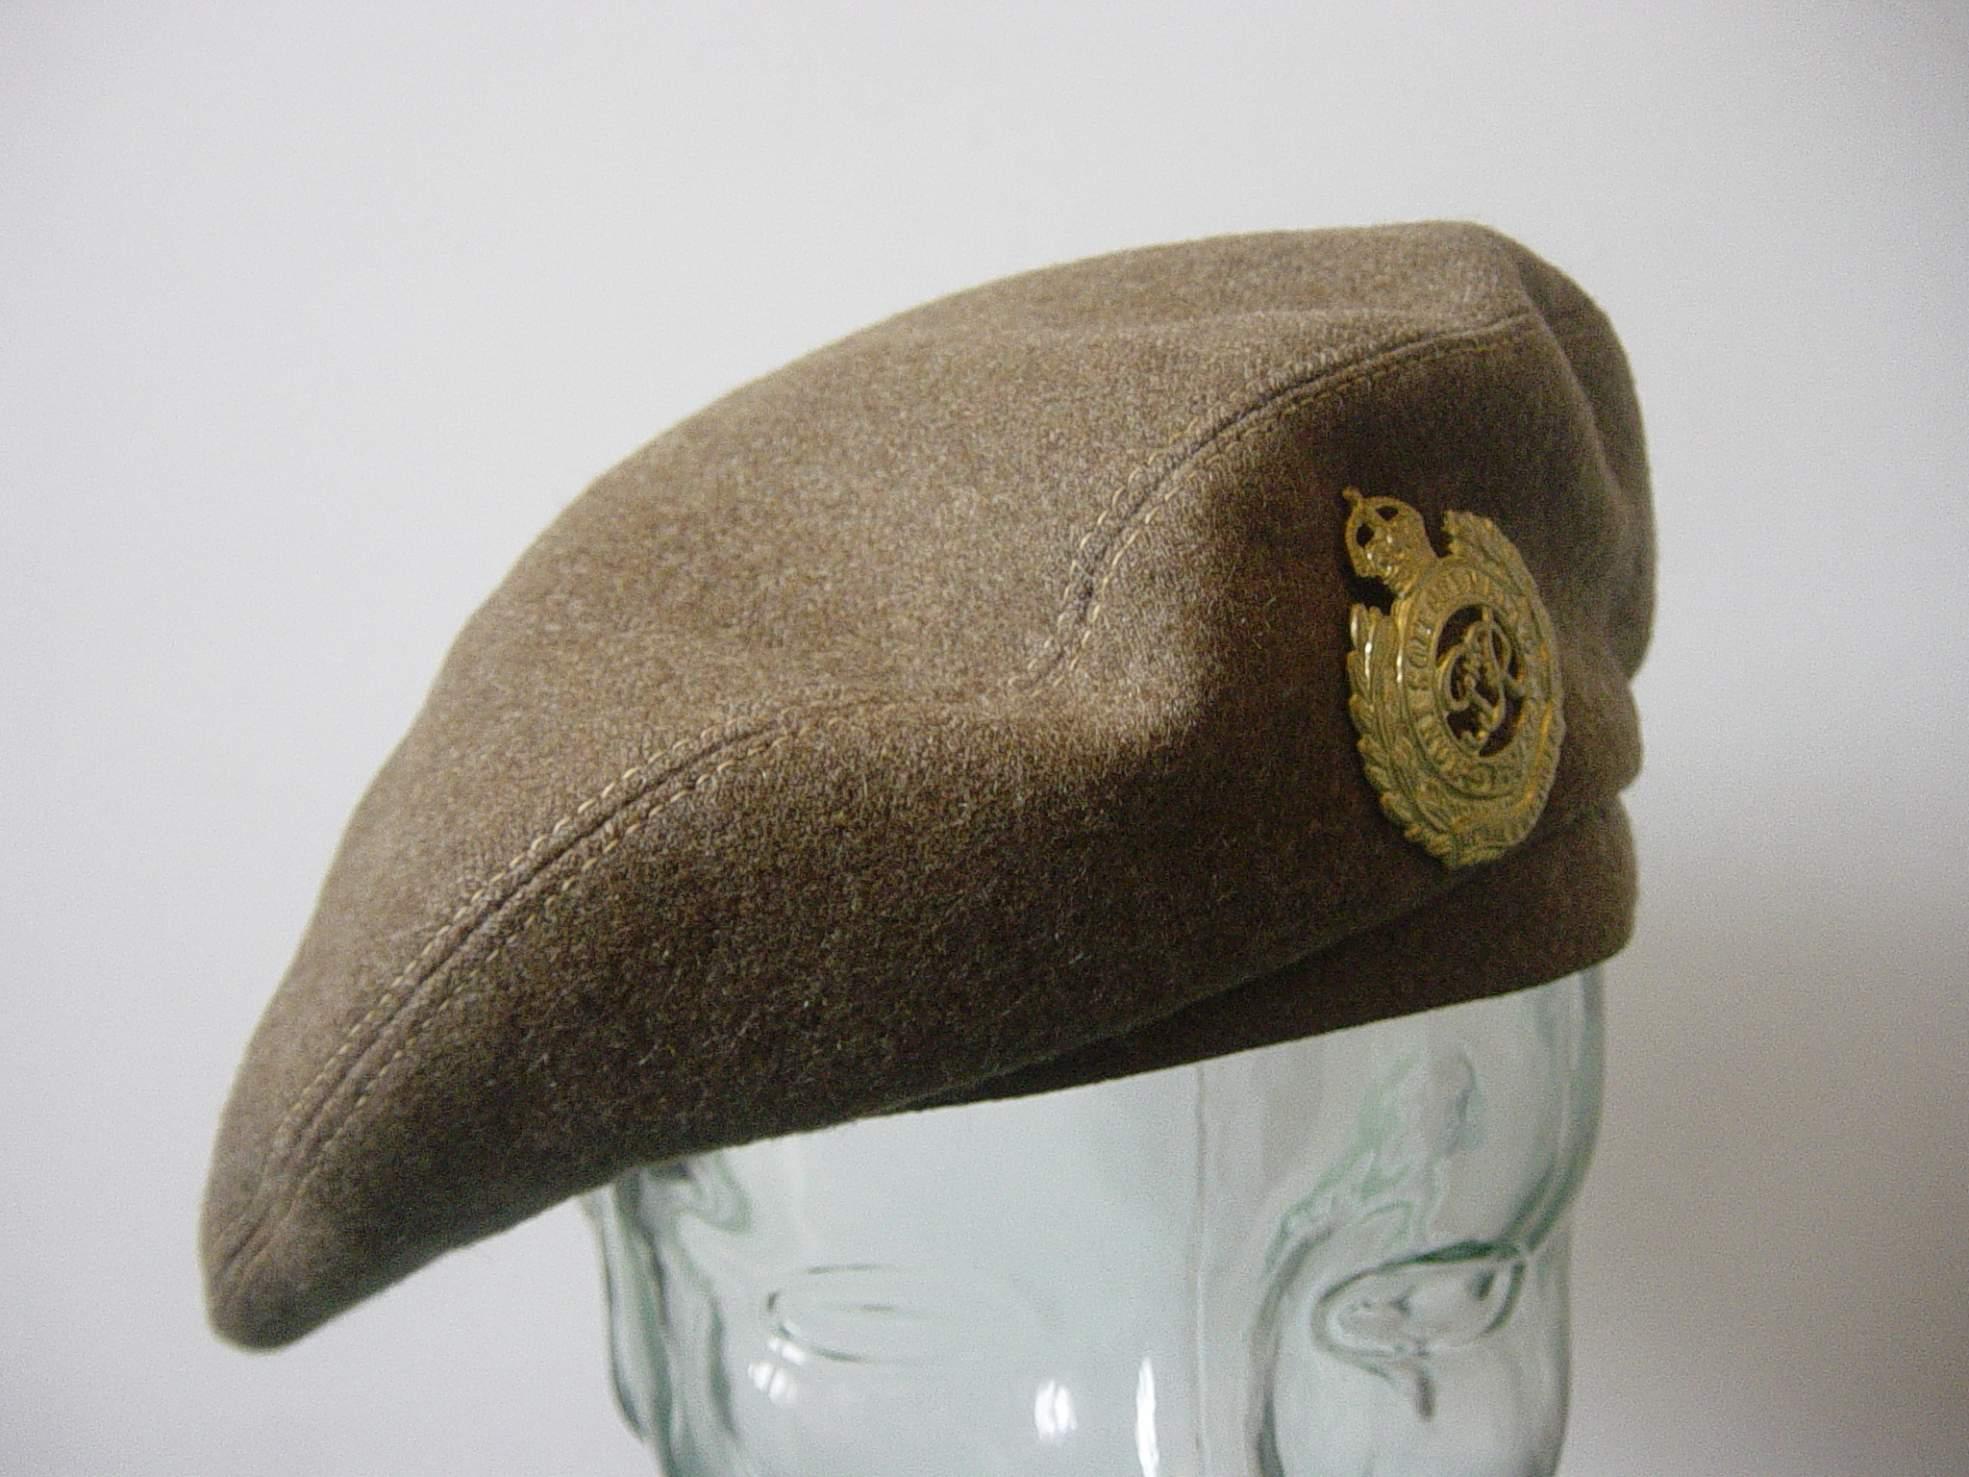 The General Service Cap Or Quot Cap Ridiculous Quot